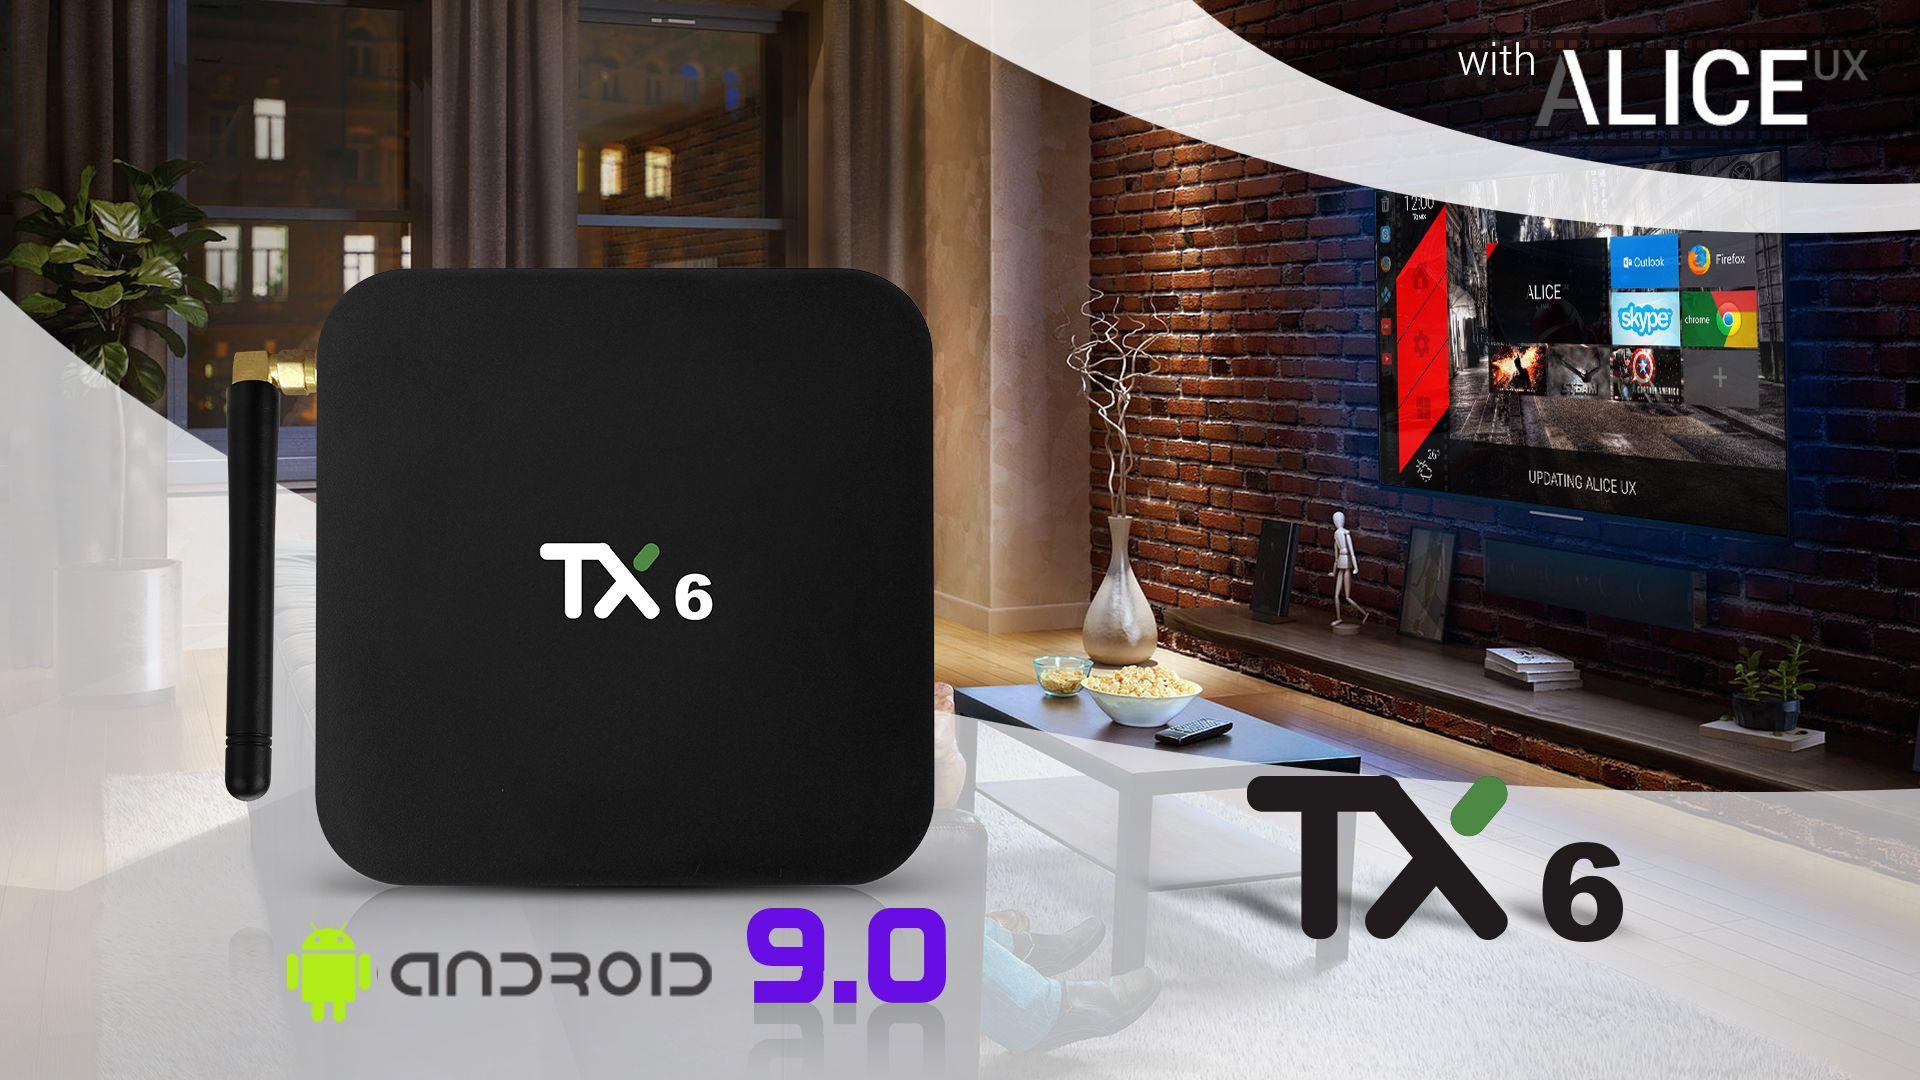 TX6 Quad 4 Core 4GB+32GB Android 9.0 TV Box Dual 2.4Ghz WIFI HD Media Player UK